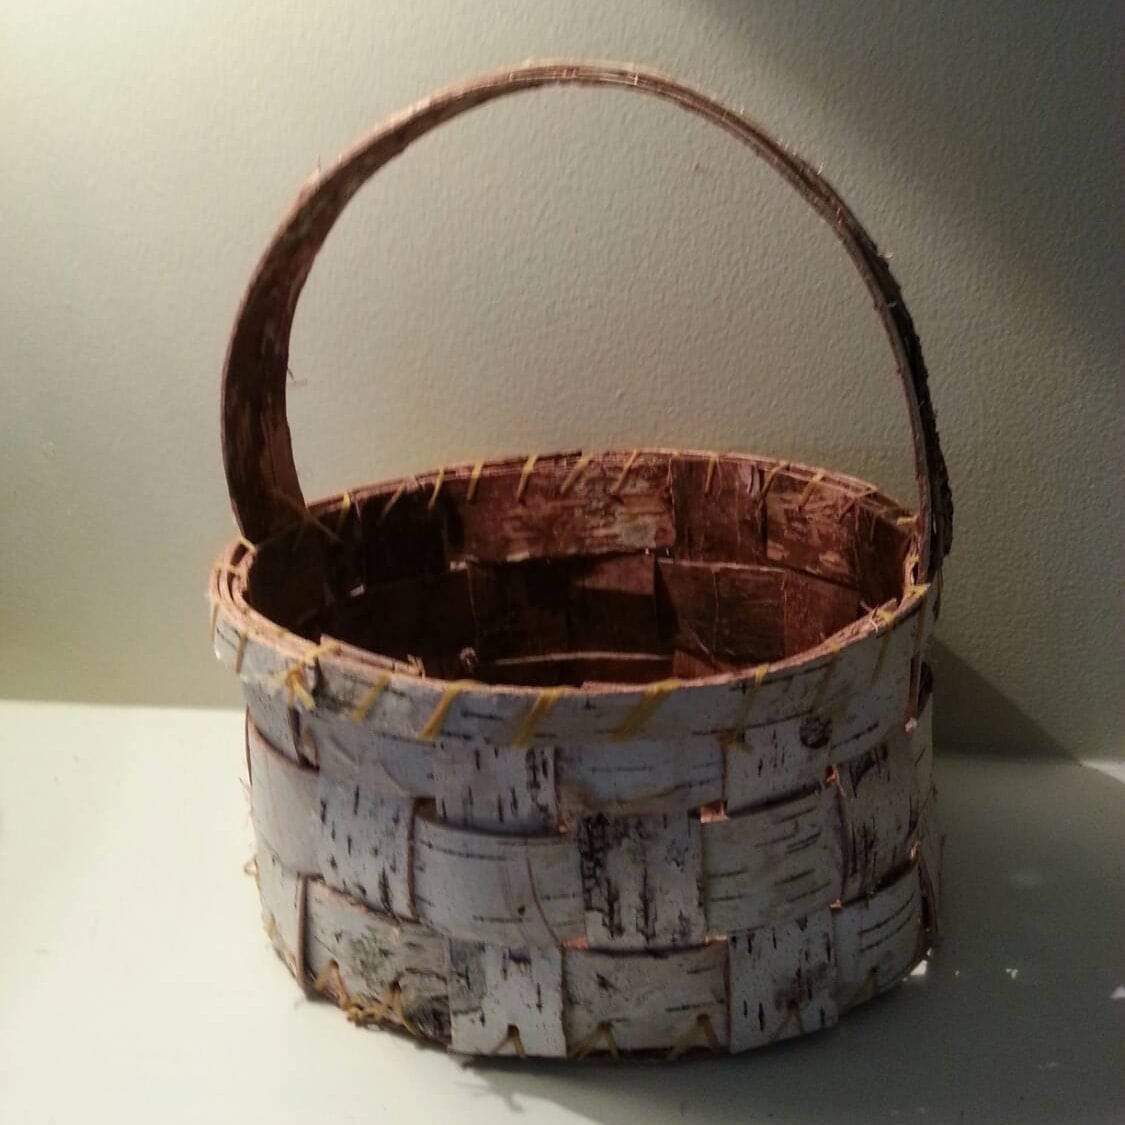 Basket Weaving Supplies Portland Oregon : Birch bark basket flower girl wedding supplies